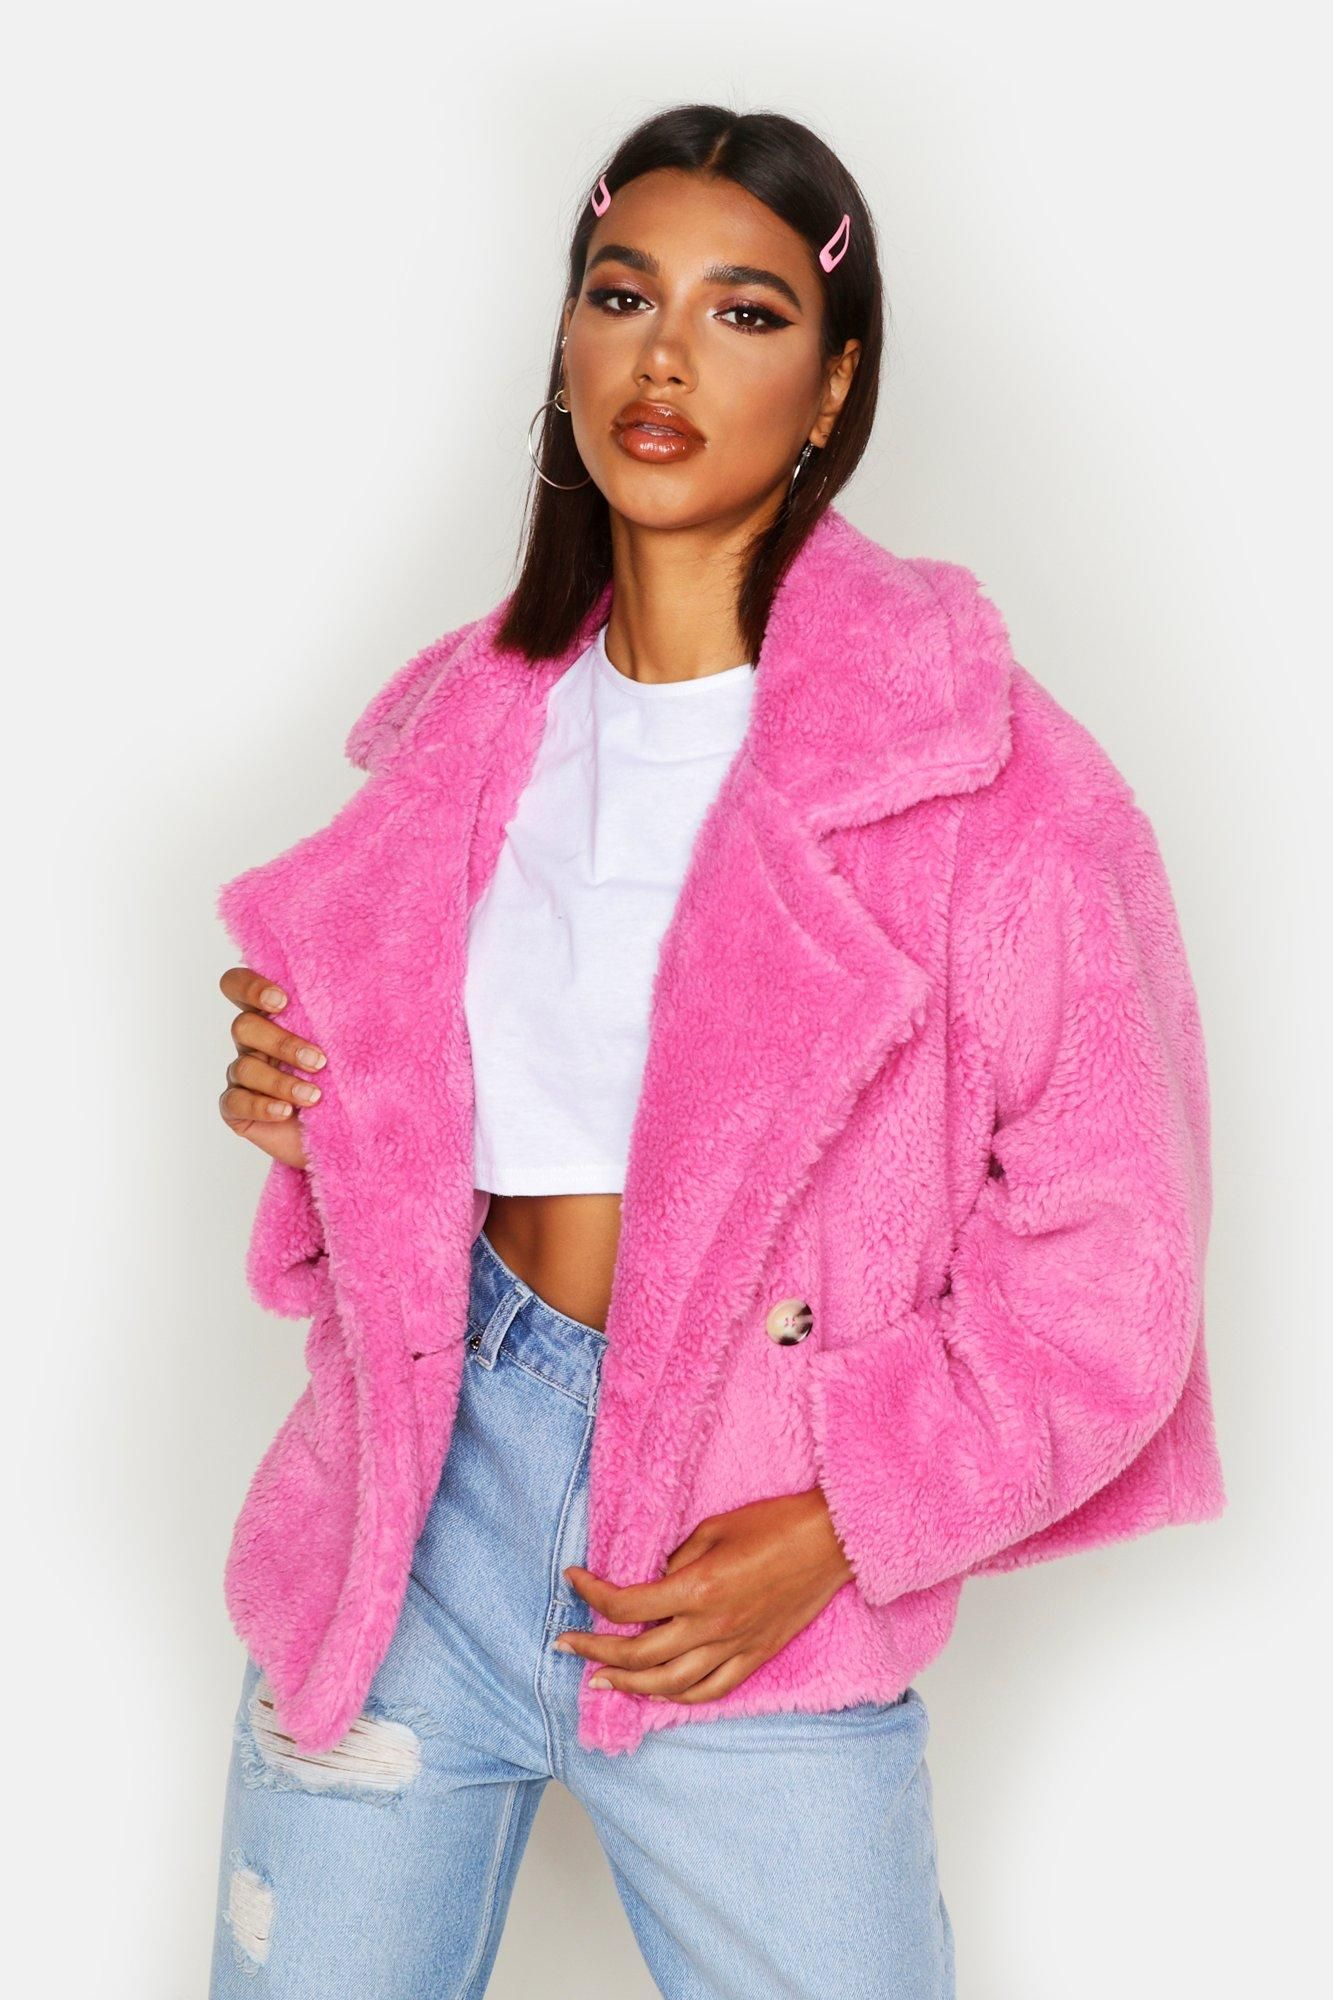 Double Breasted Short Teddy Faux Fur Coat Boohoo Faux Fur Coat Short Faux Fur Jacket Pink Fur Coat [ 2000 x 1333 Pixel ]